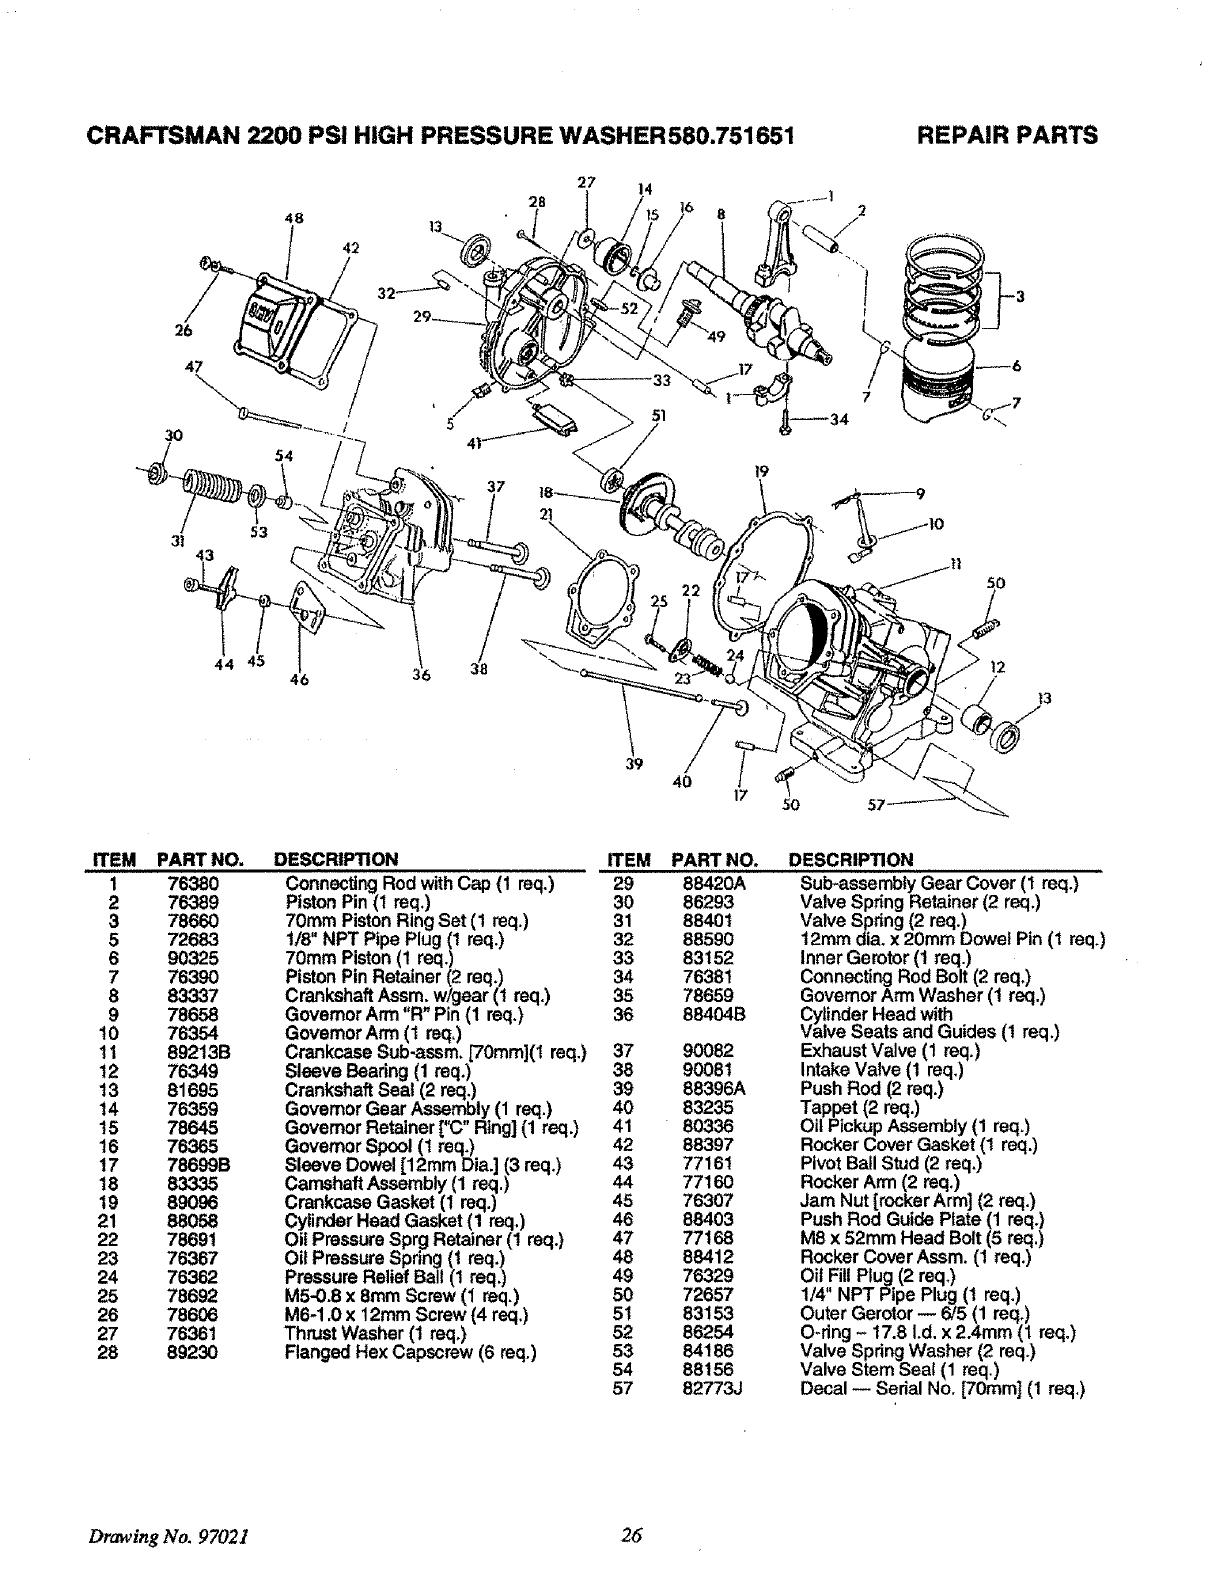 Craftsman 580 751651 Owners Manual